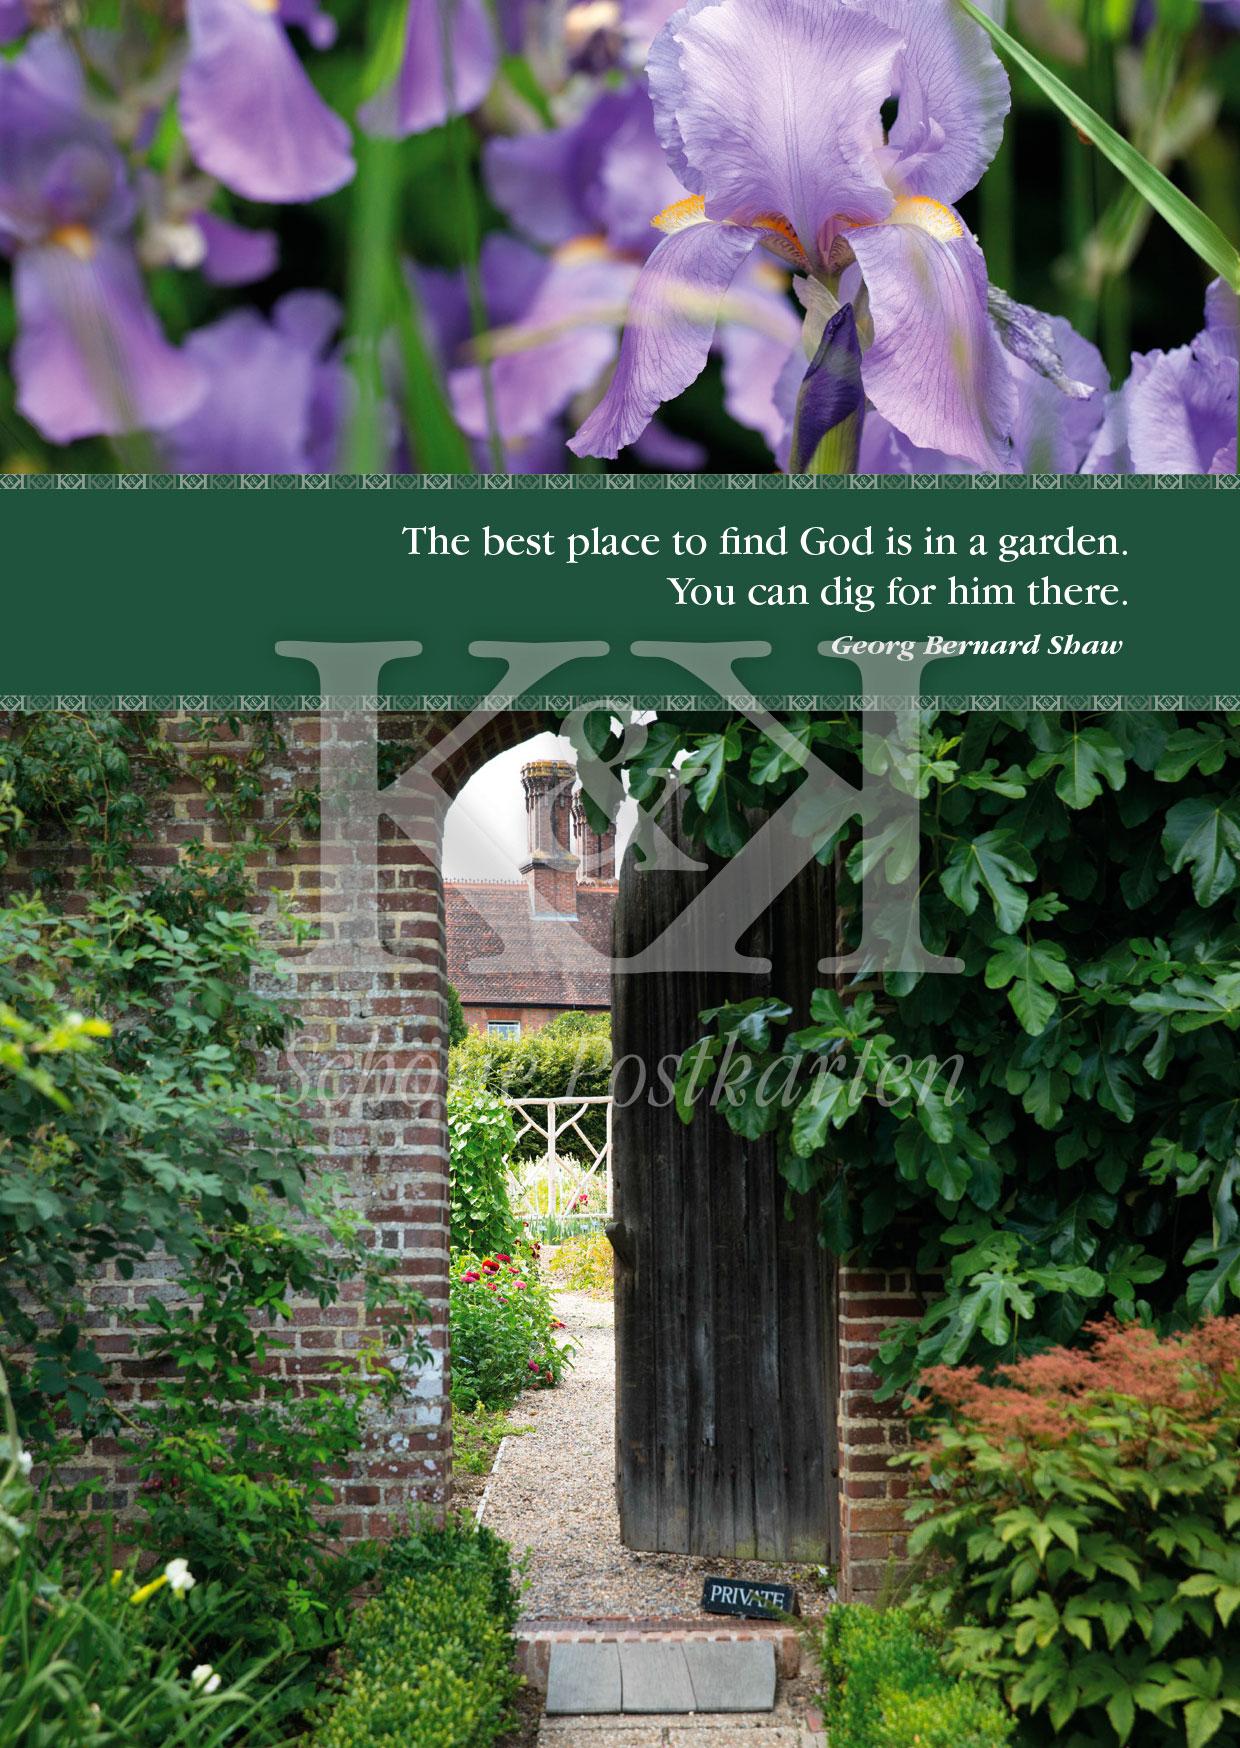 Schöne Postkarte Nr. 13 · Dig in the Garden, George Bernard Shaw · © 2018